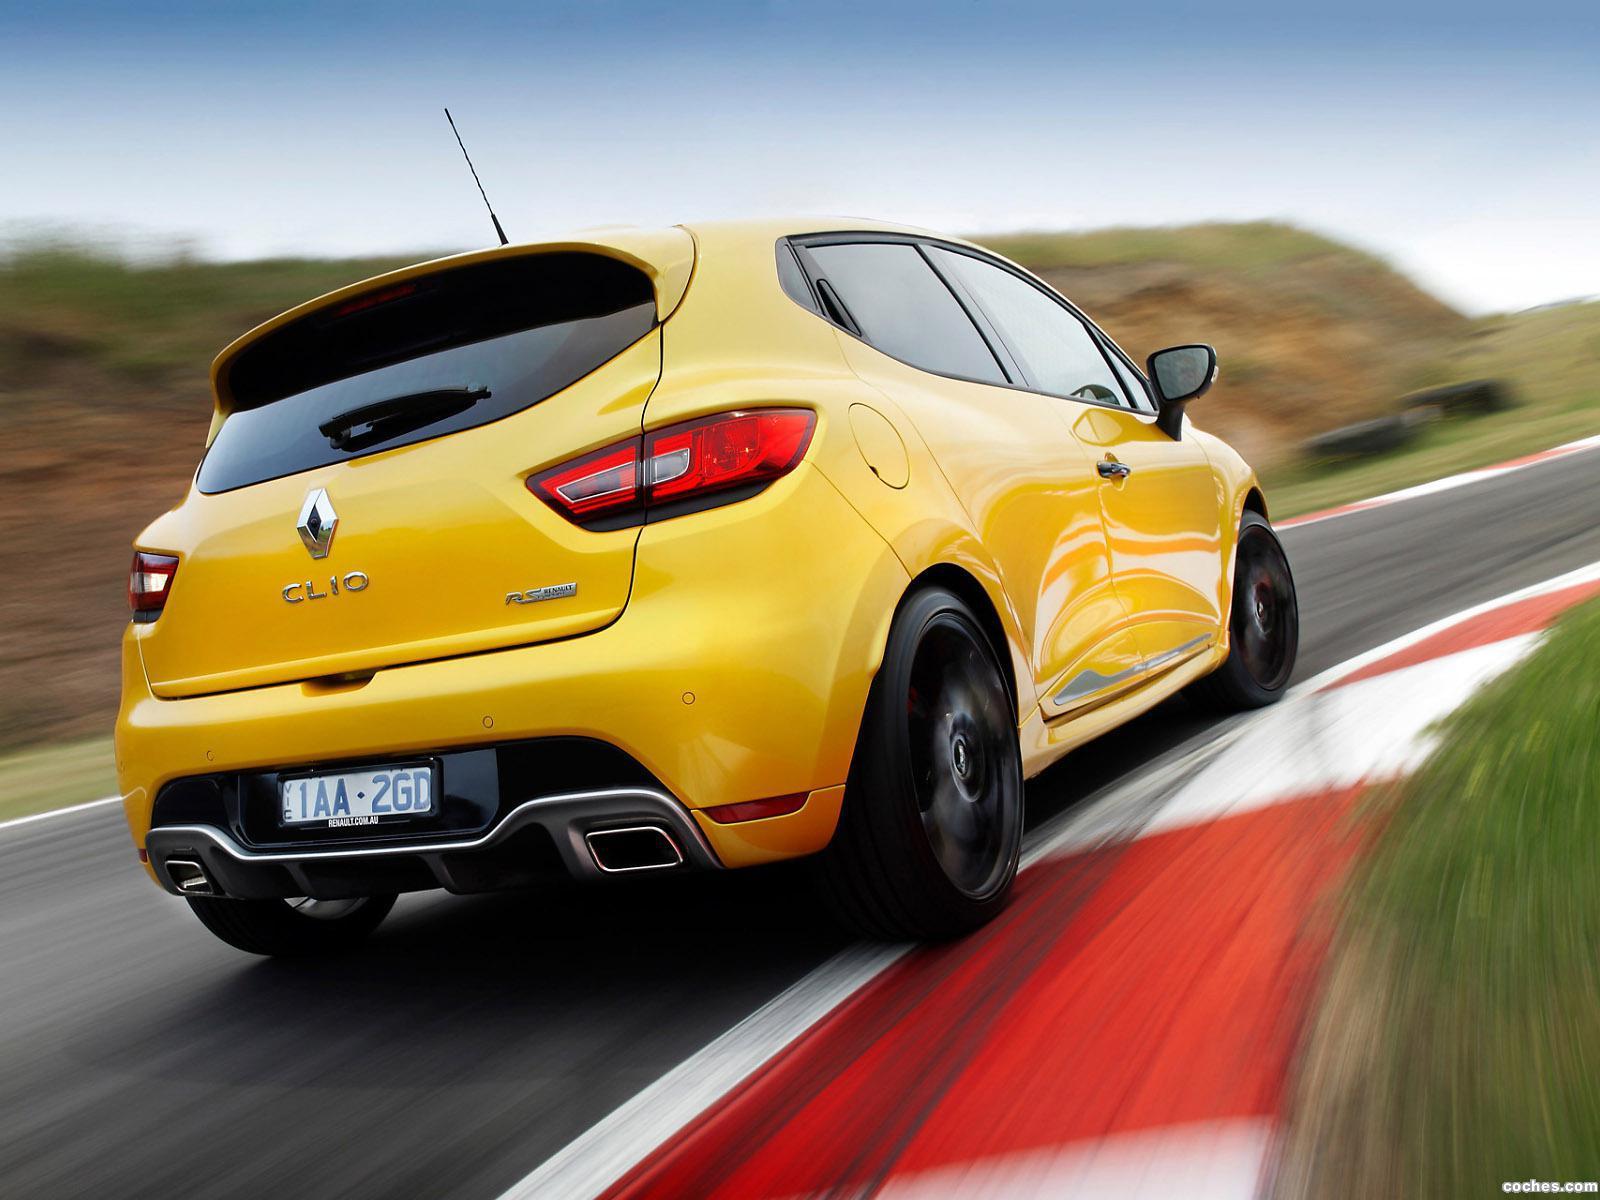 Foto 4 de Renault Clio R.S. 200 Australia 2014